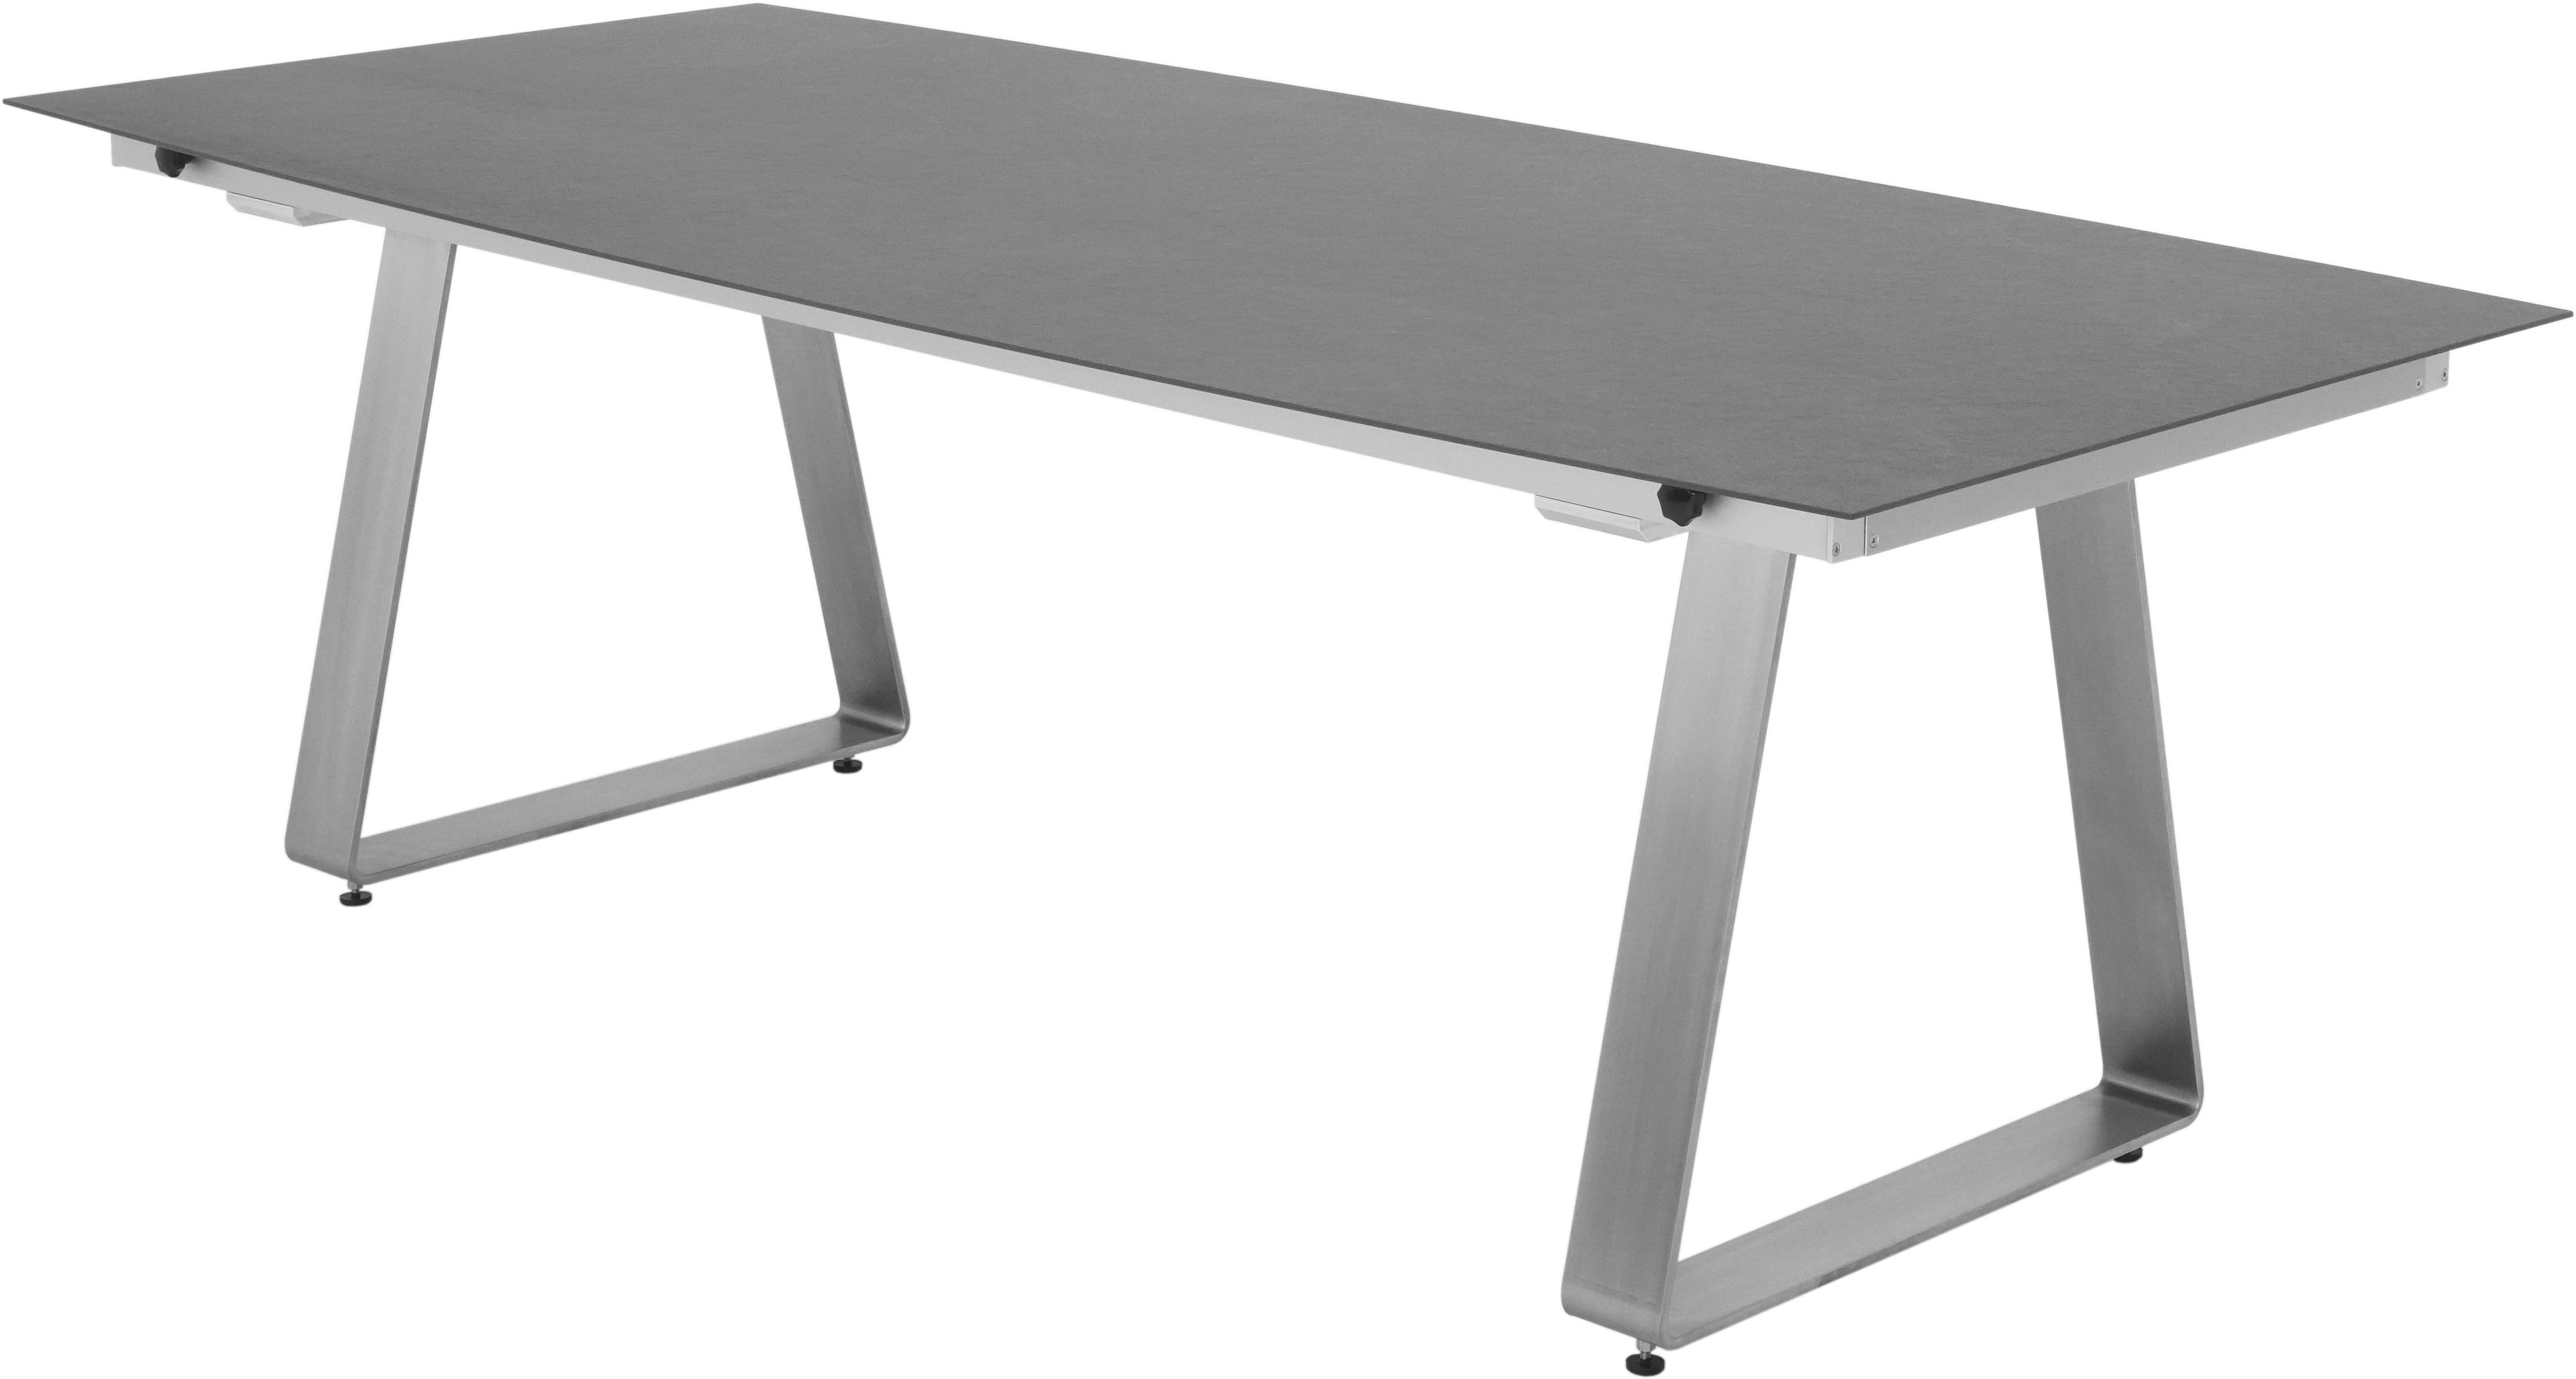 DELTA AZ Tisch Rechteckig Fix 220 x 100 Eiche Dunkel 971004 - weiss